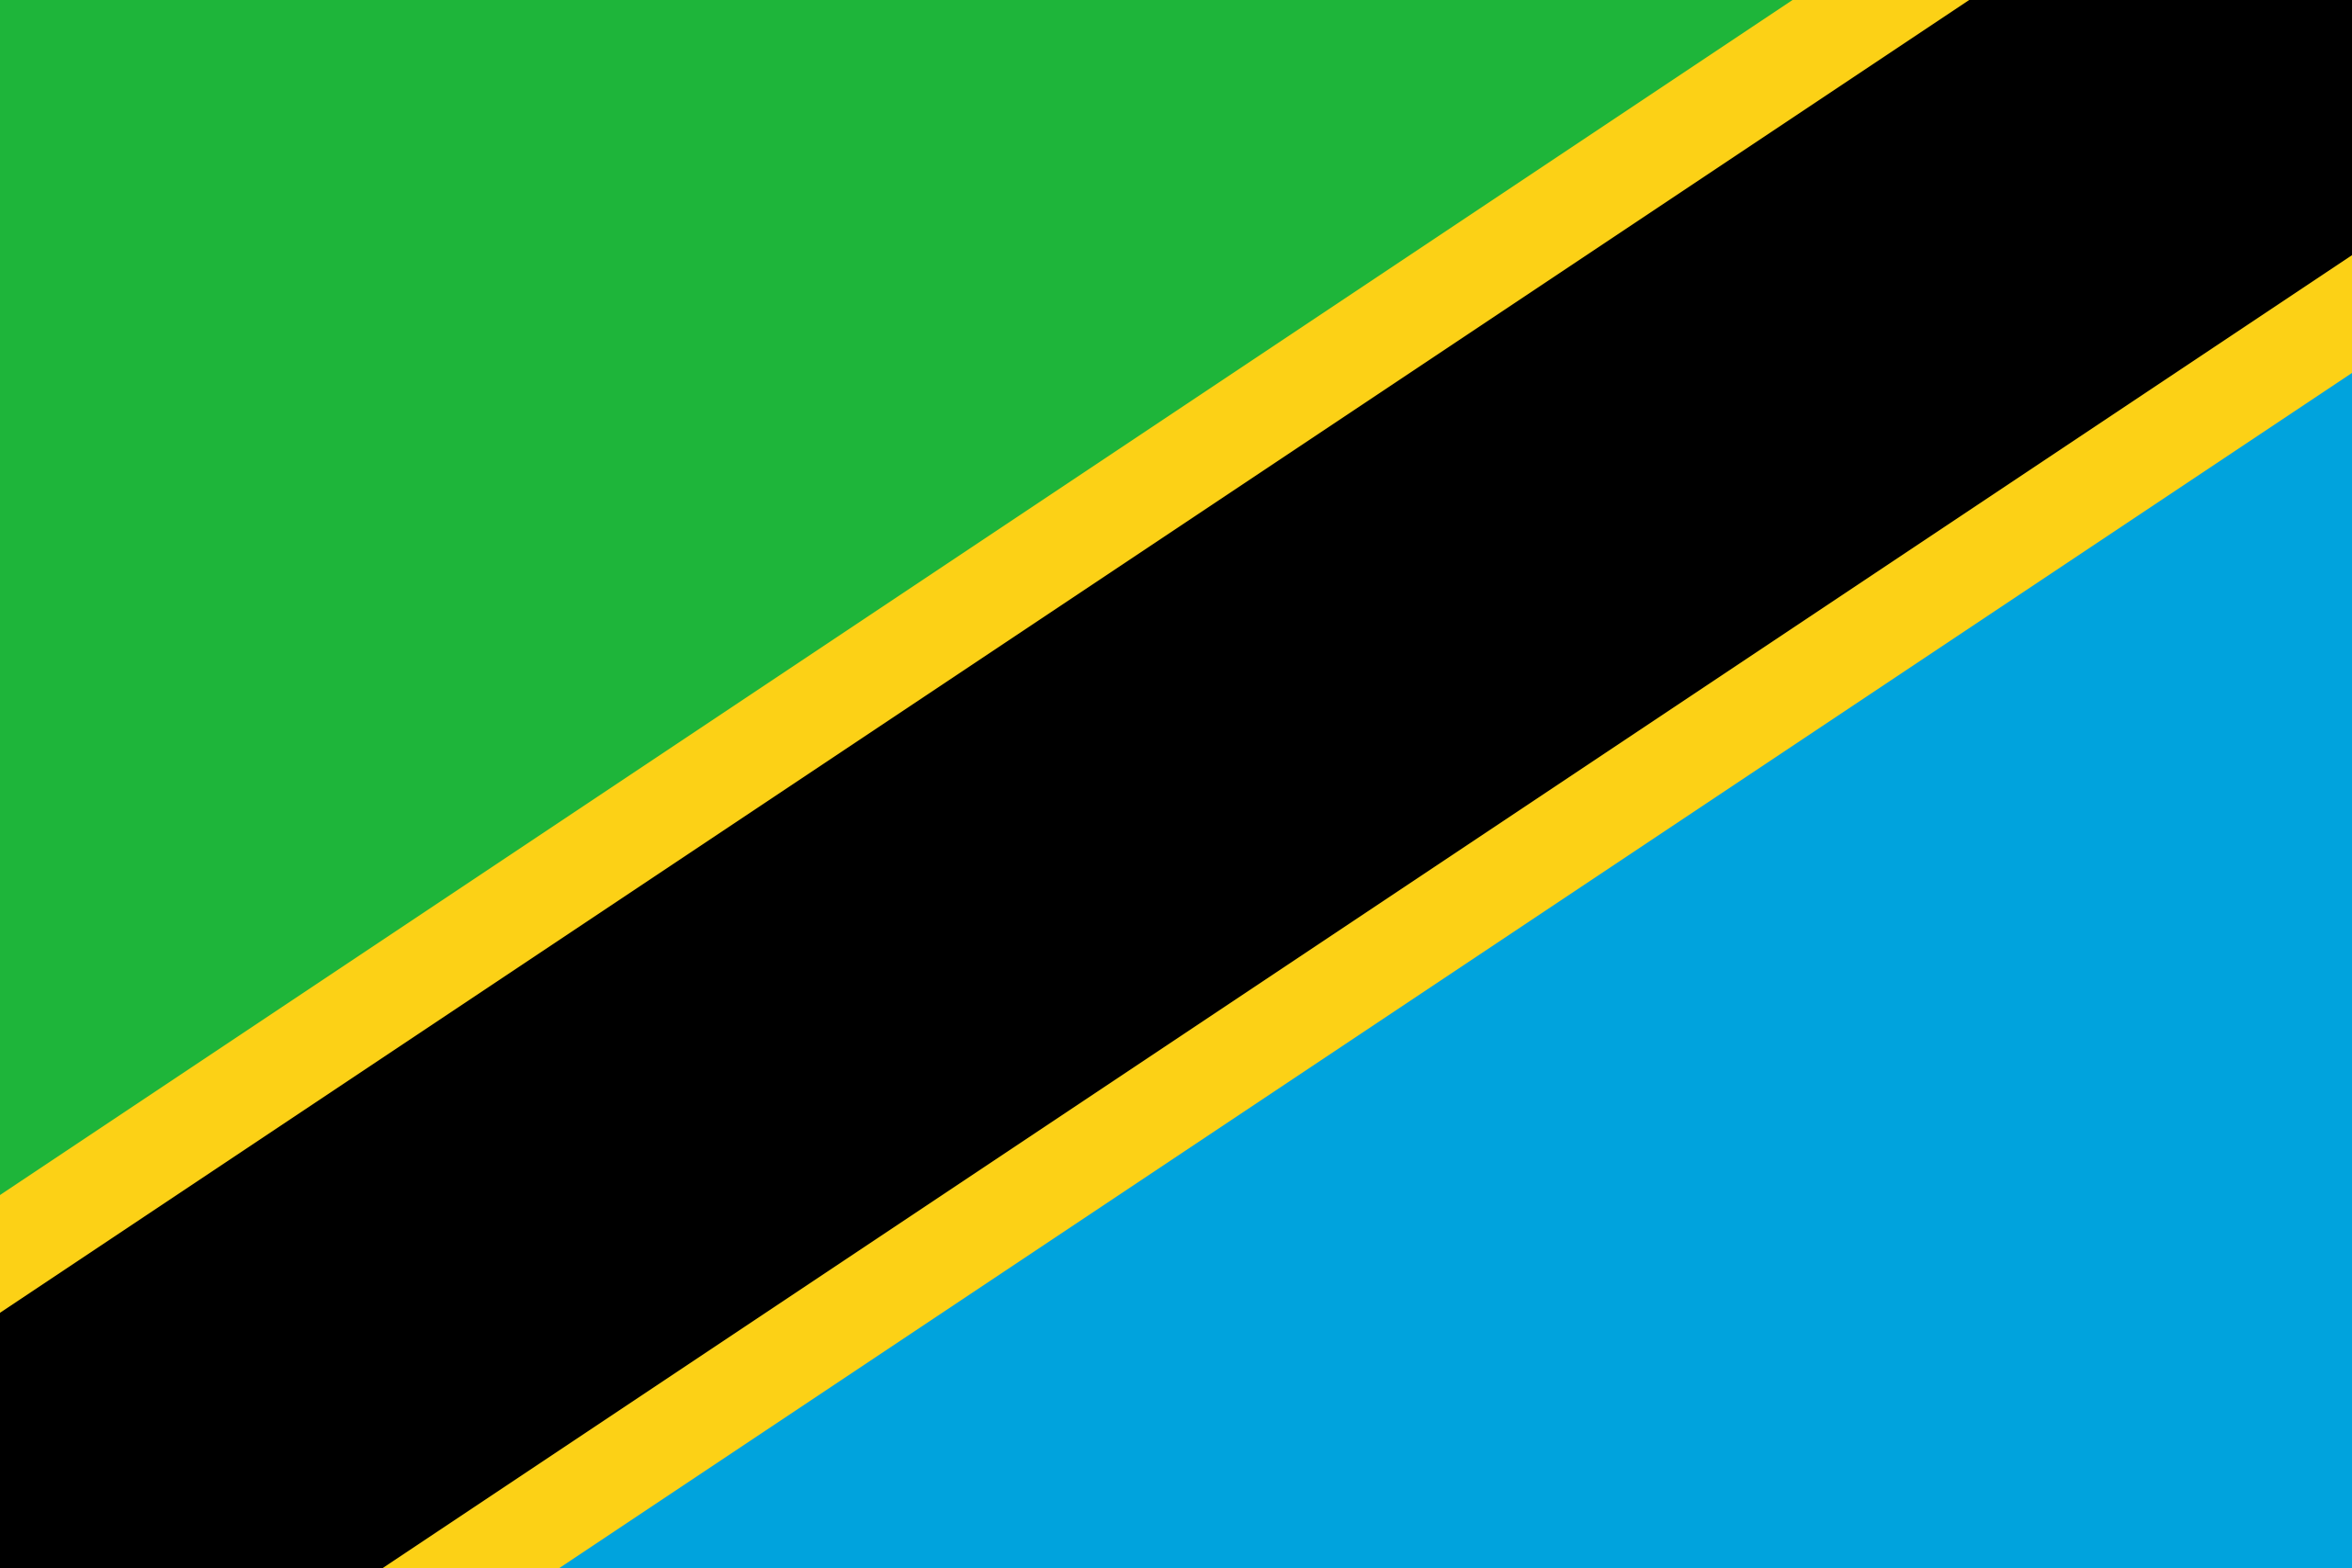 tanzania, 国家, 会徽, 徽标, 符号 - 高清壁纸 - 教授-falken.com